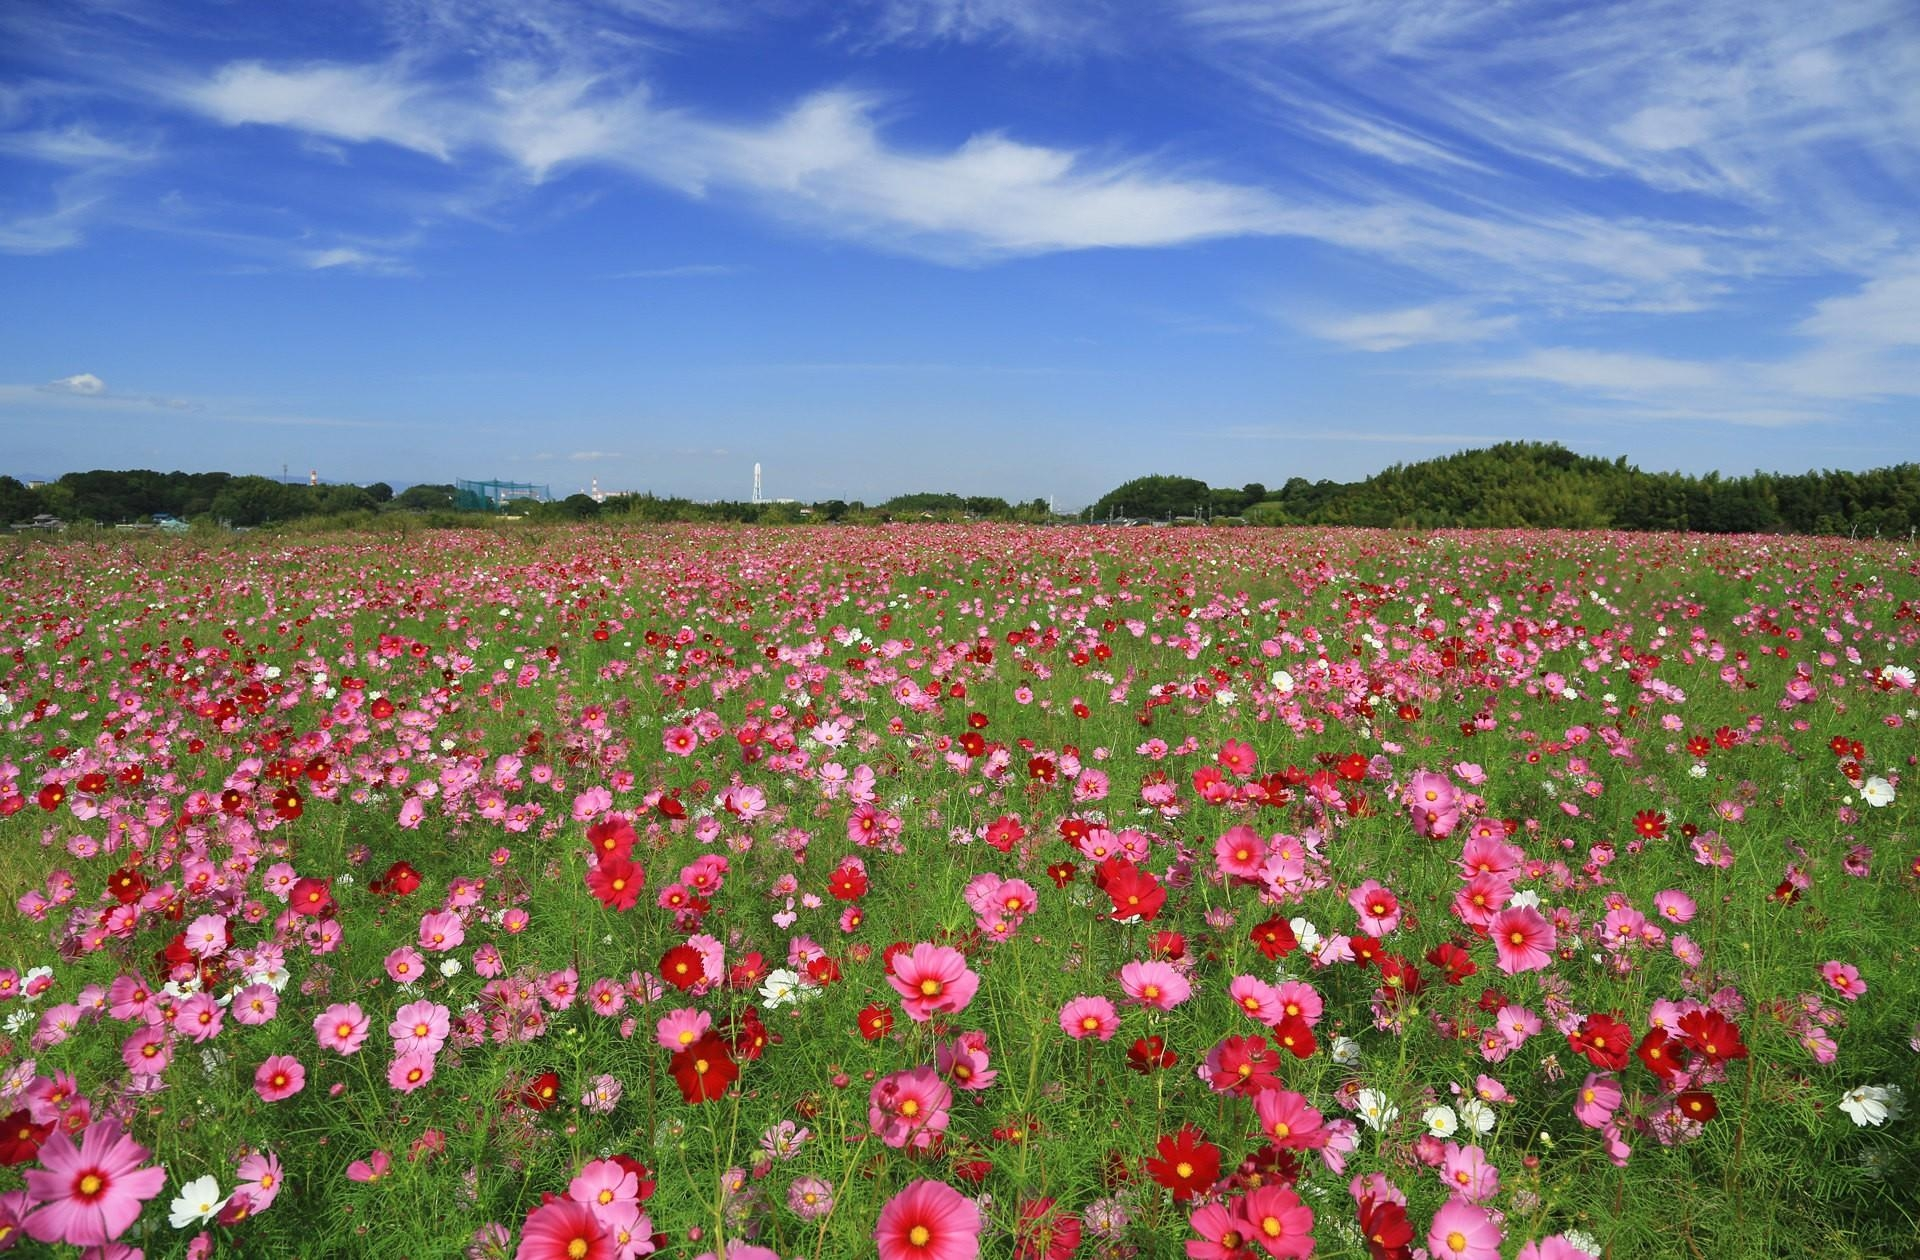 Интерьер аппликация цветочная полянка картон